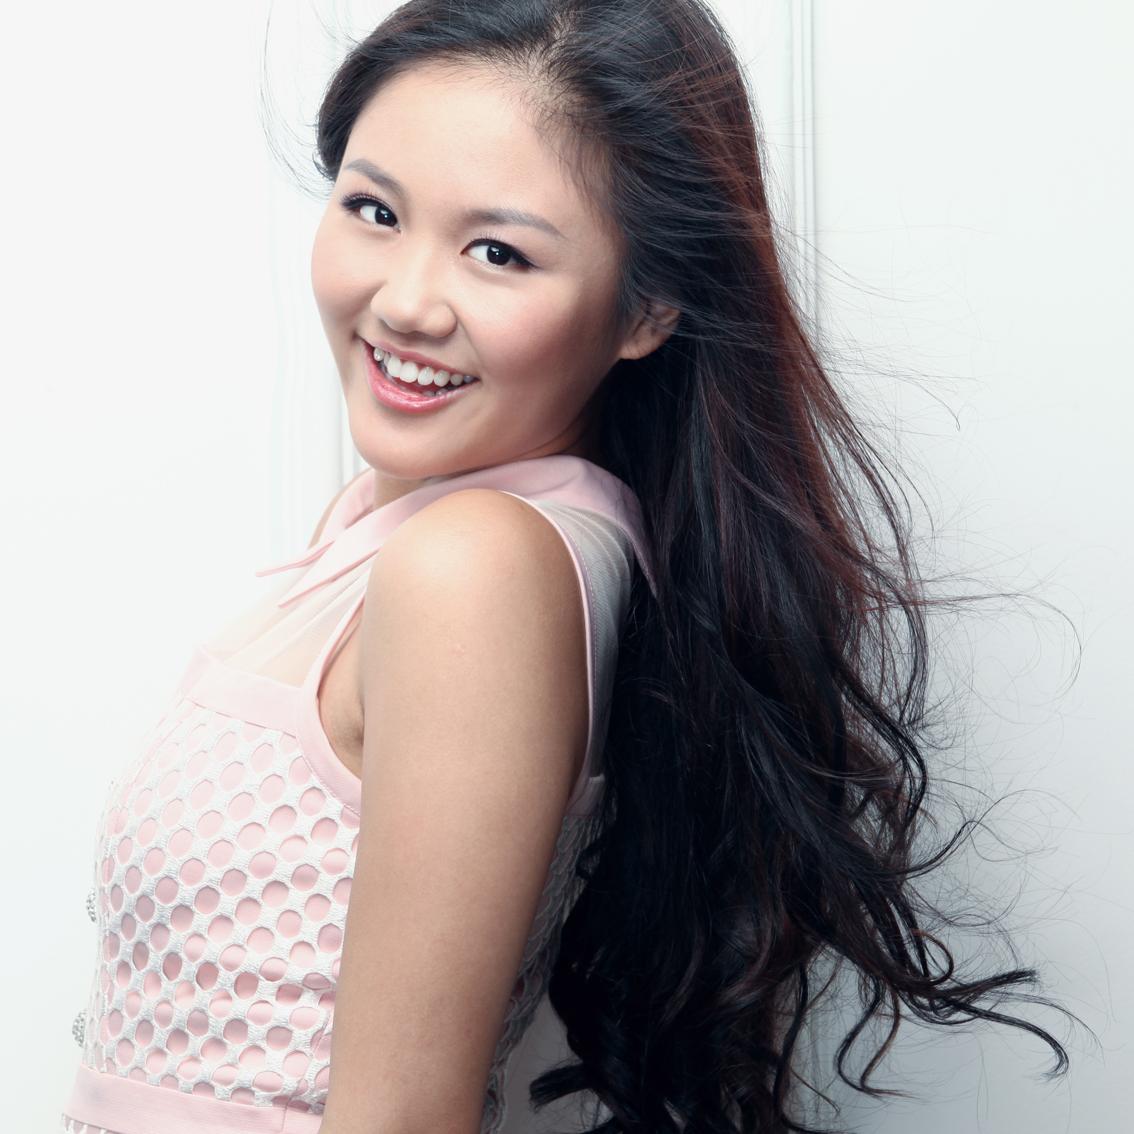 Singer Van Mai Huong - age: 26